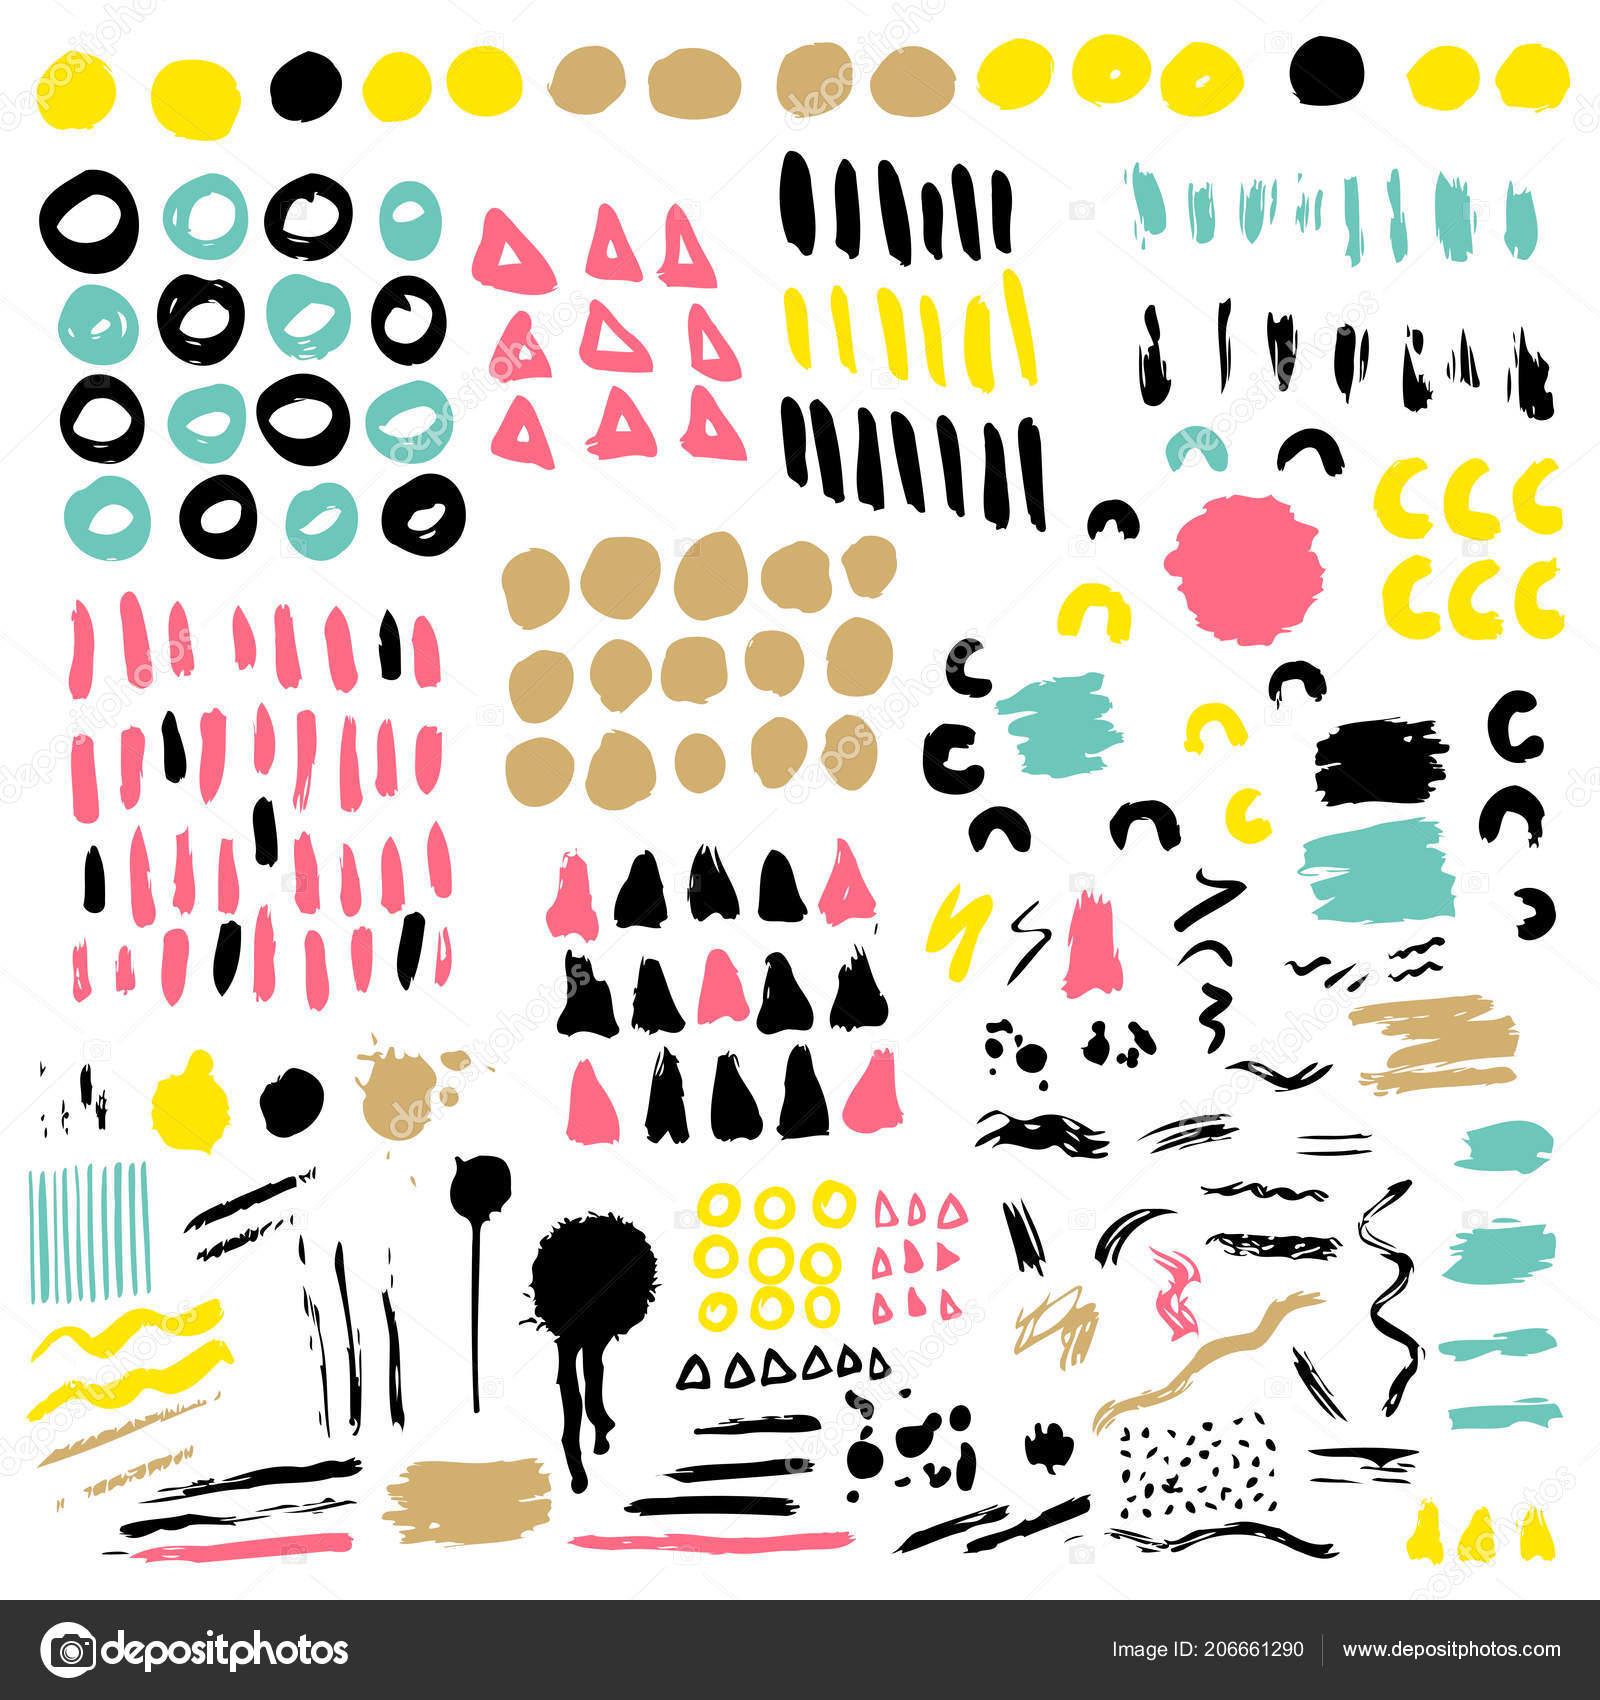 Trendy Vector Colorful Set Brush Strokes Design Backgrounds Wallpaper Cover Stock Vector C Tolchik 206661290